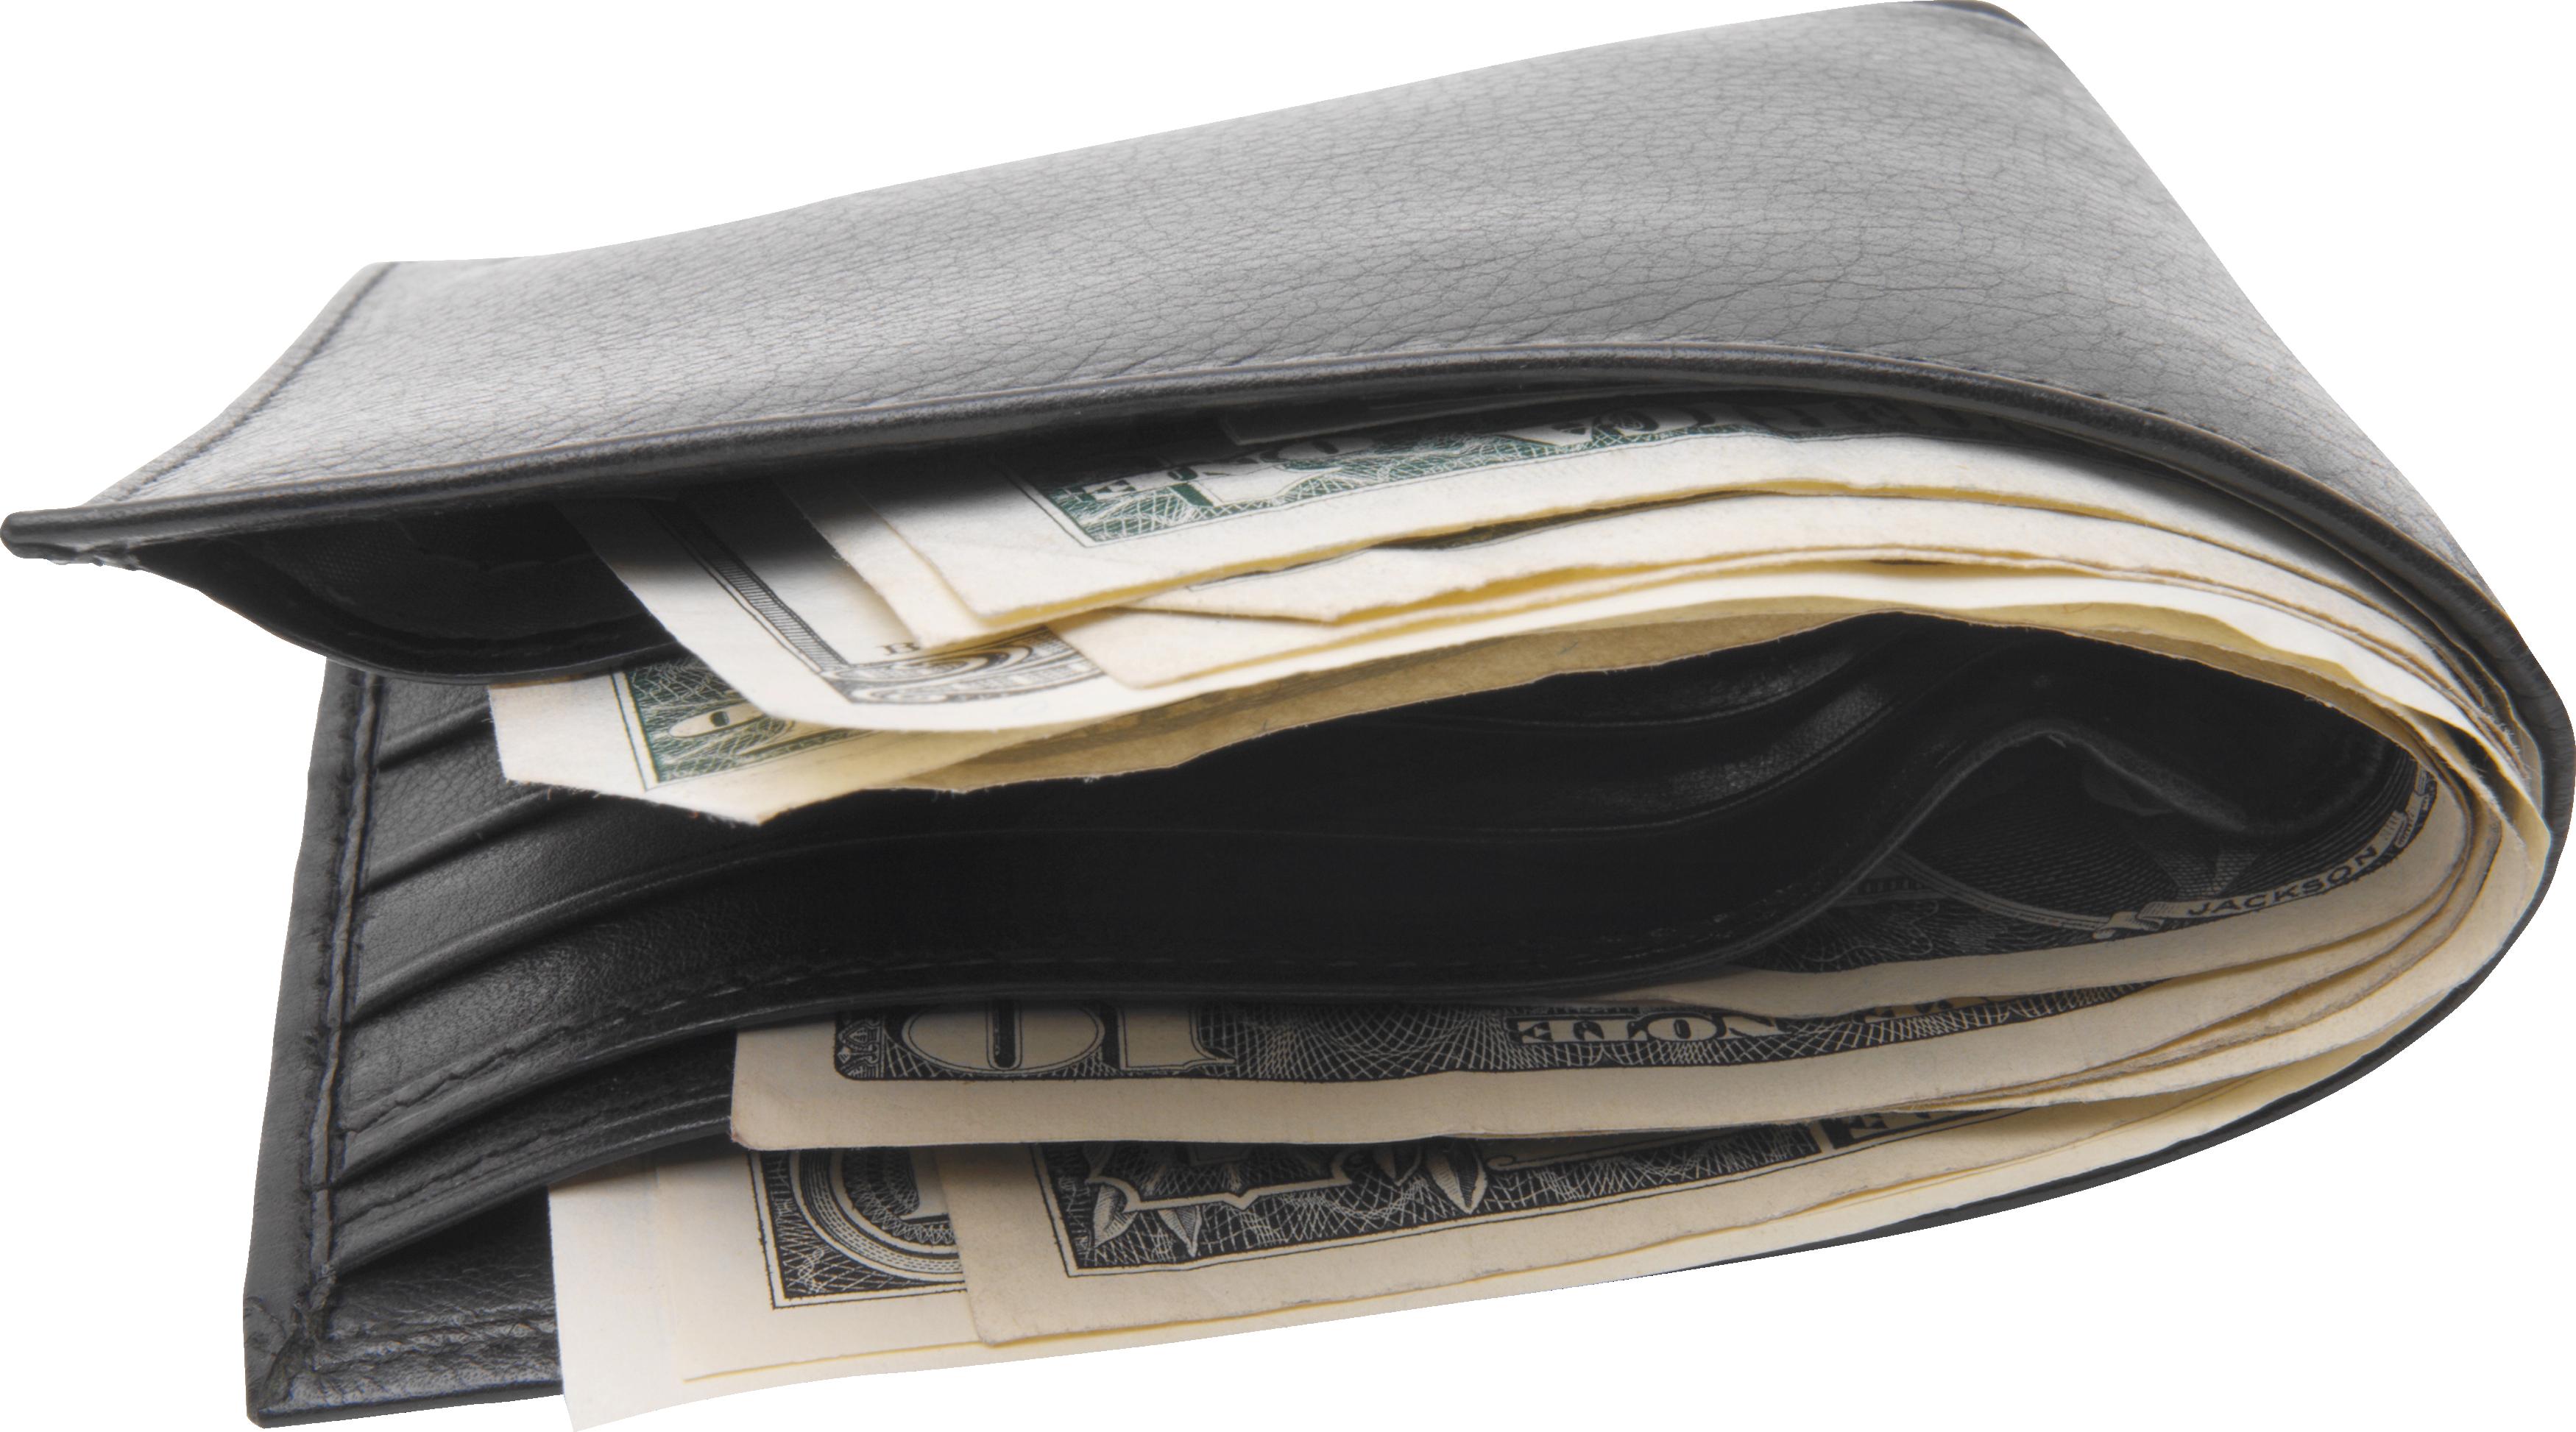 Wallet PNG - 2292